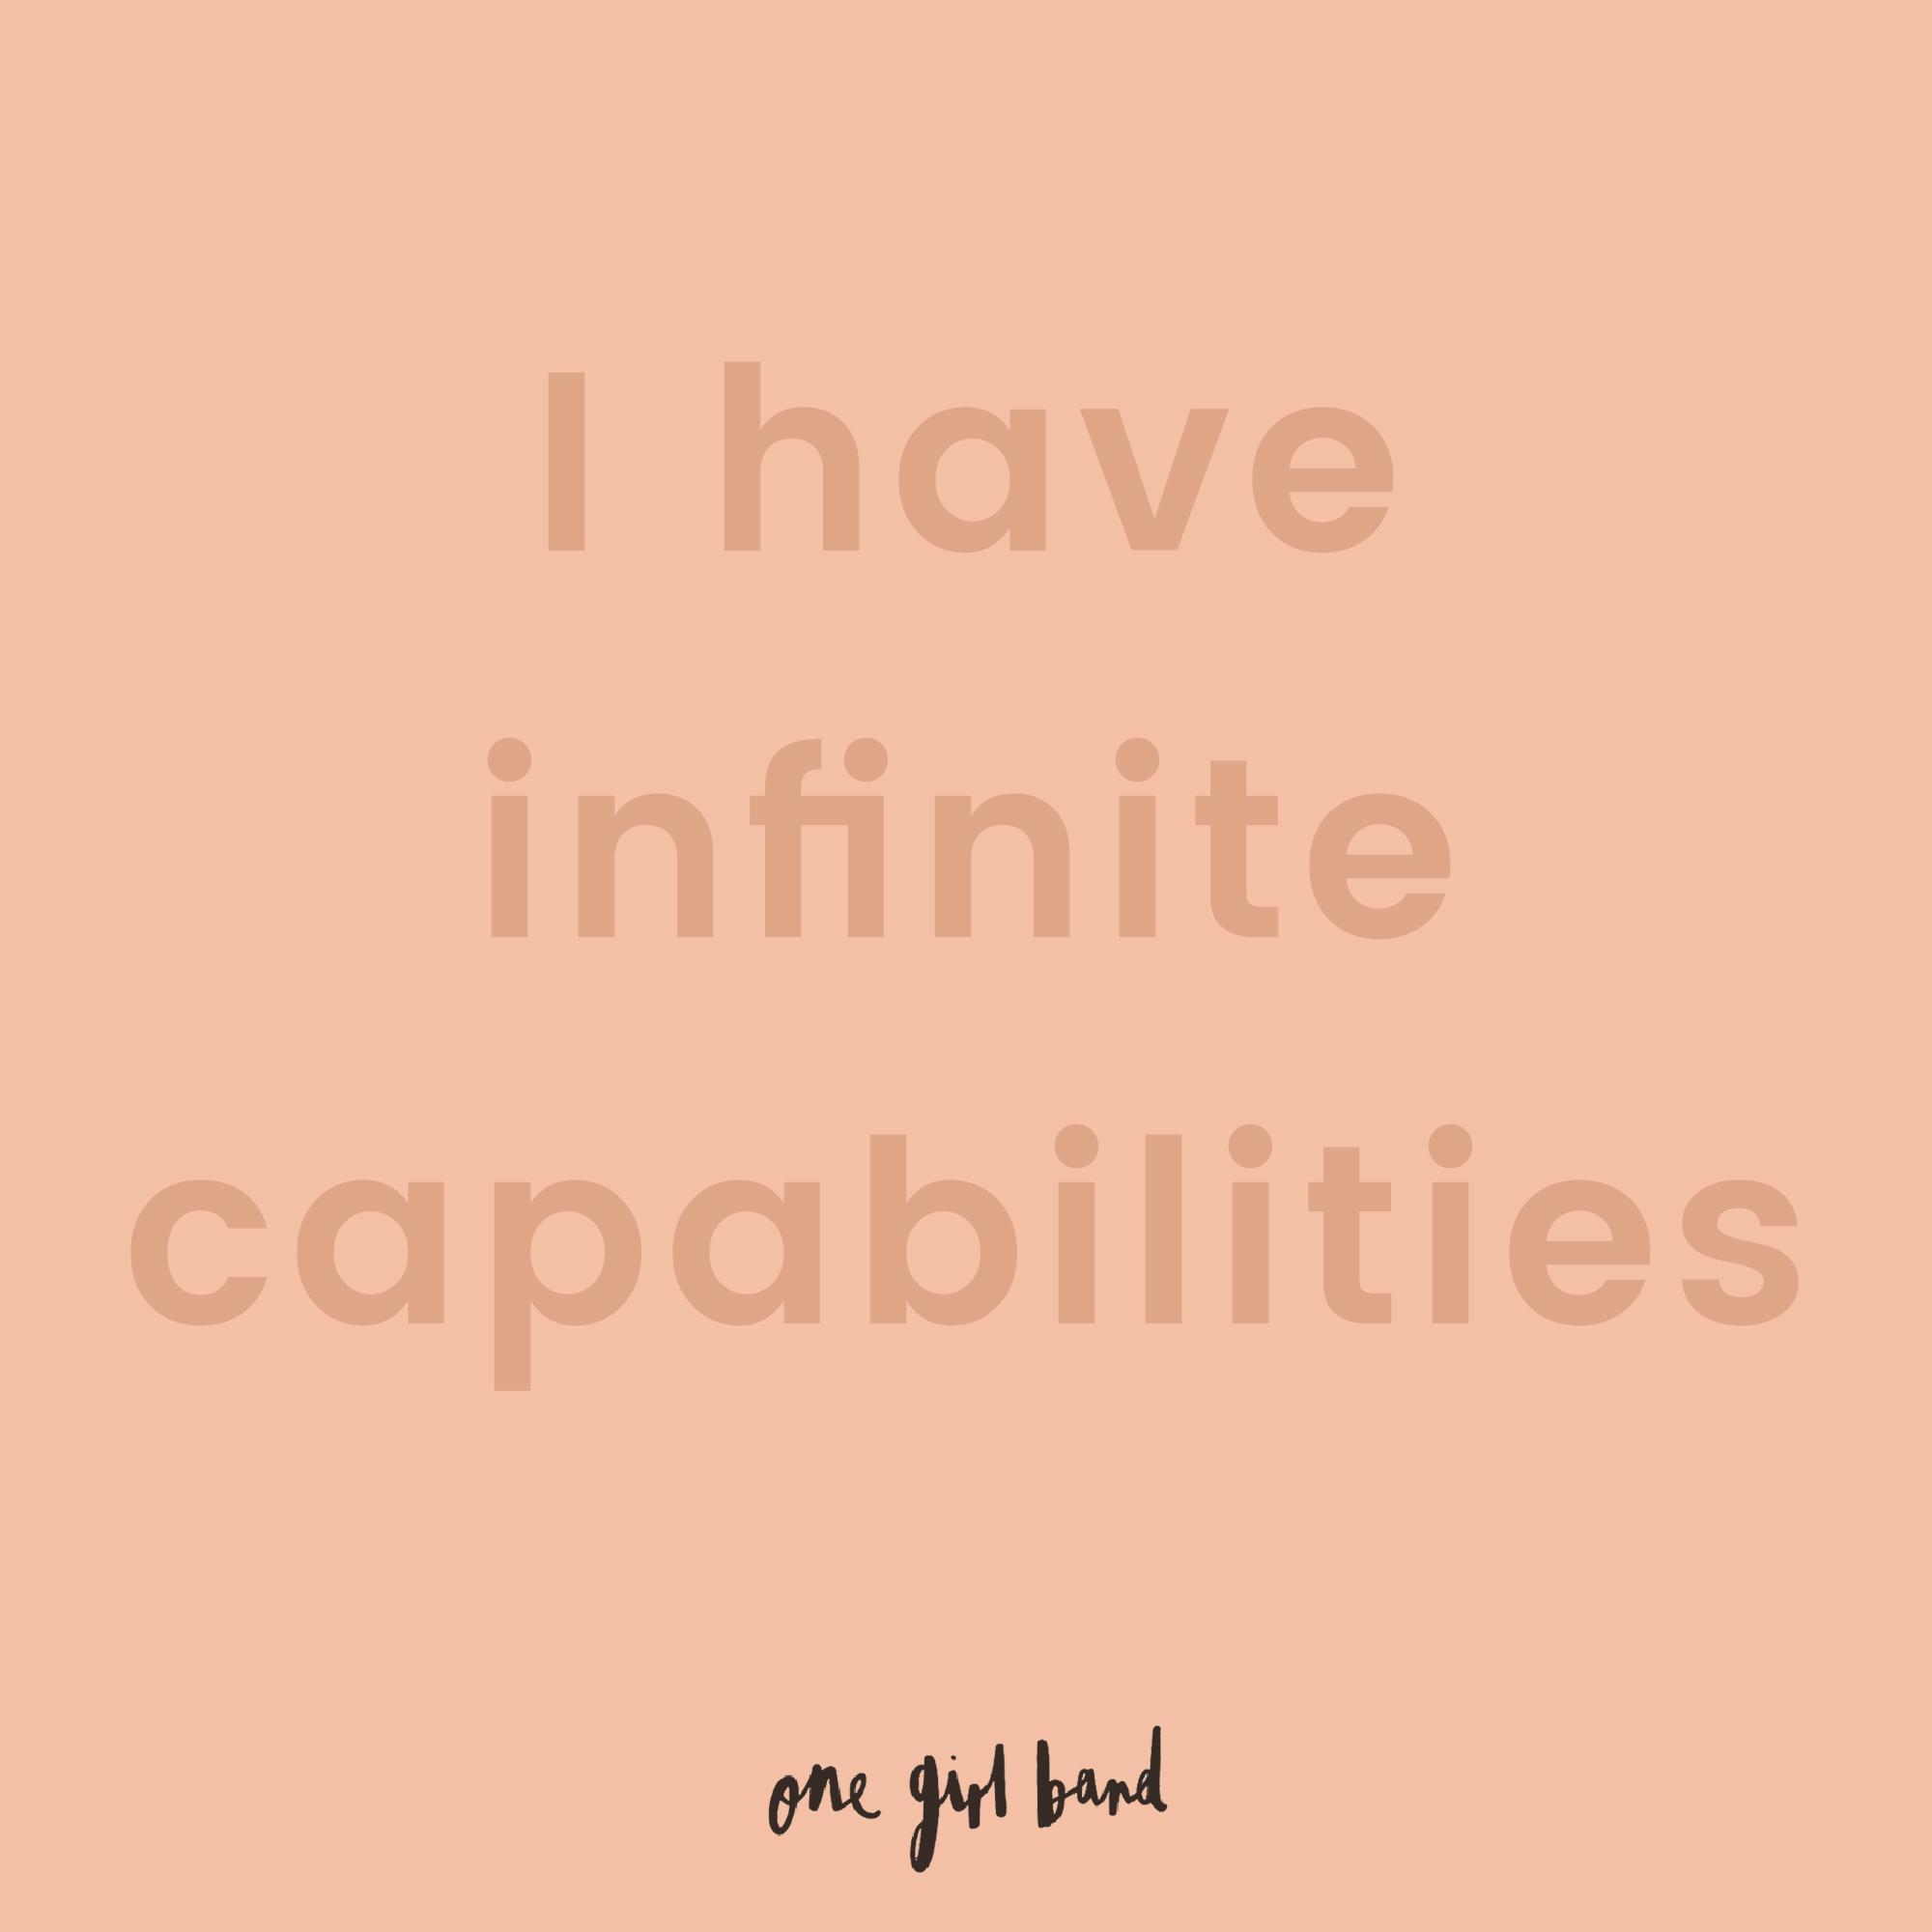 OGB_I have infinite capabilities%0D.jpg